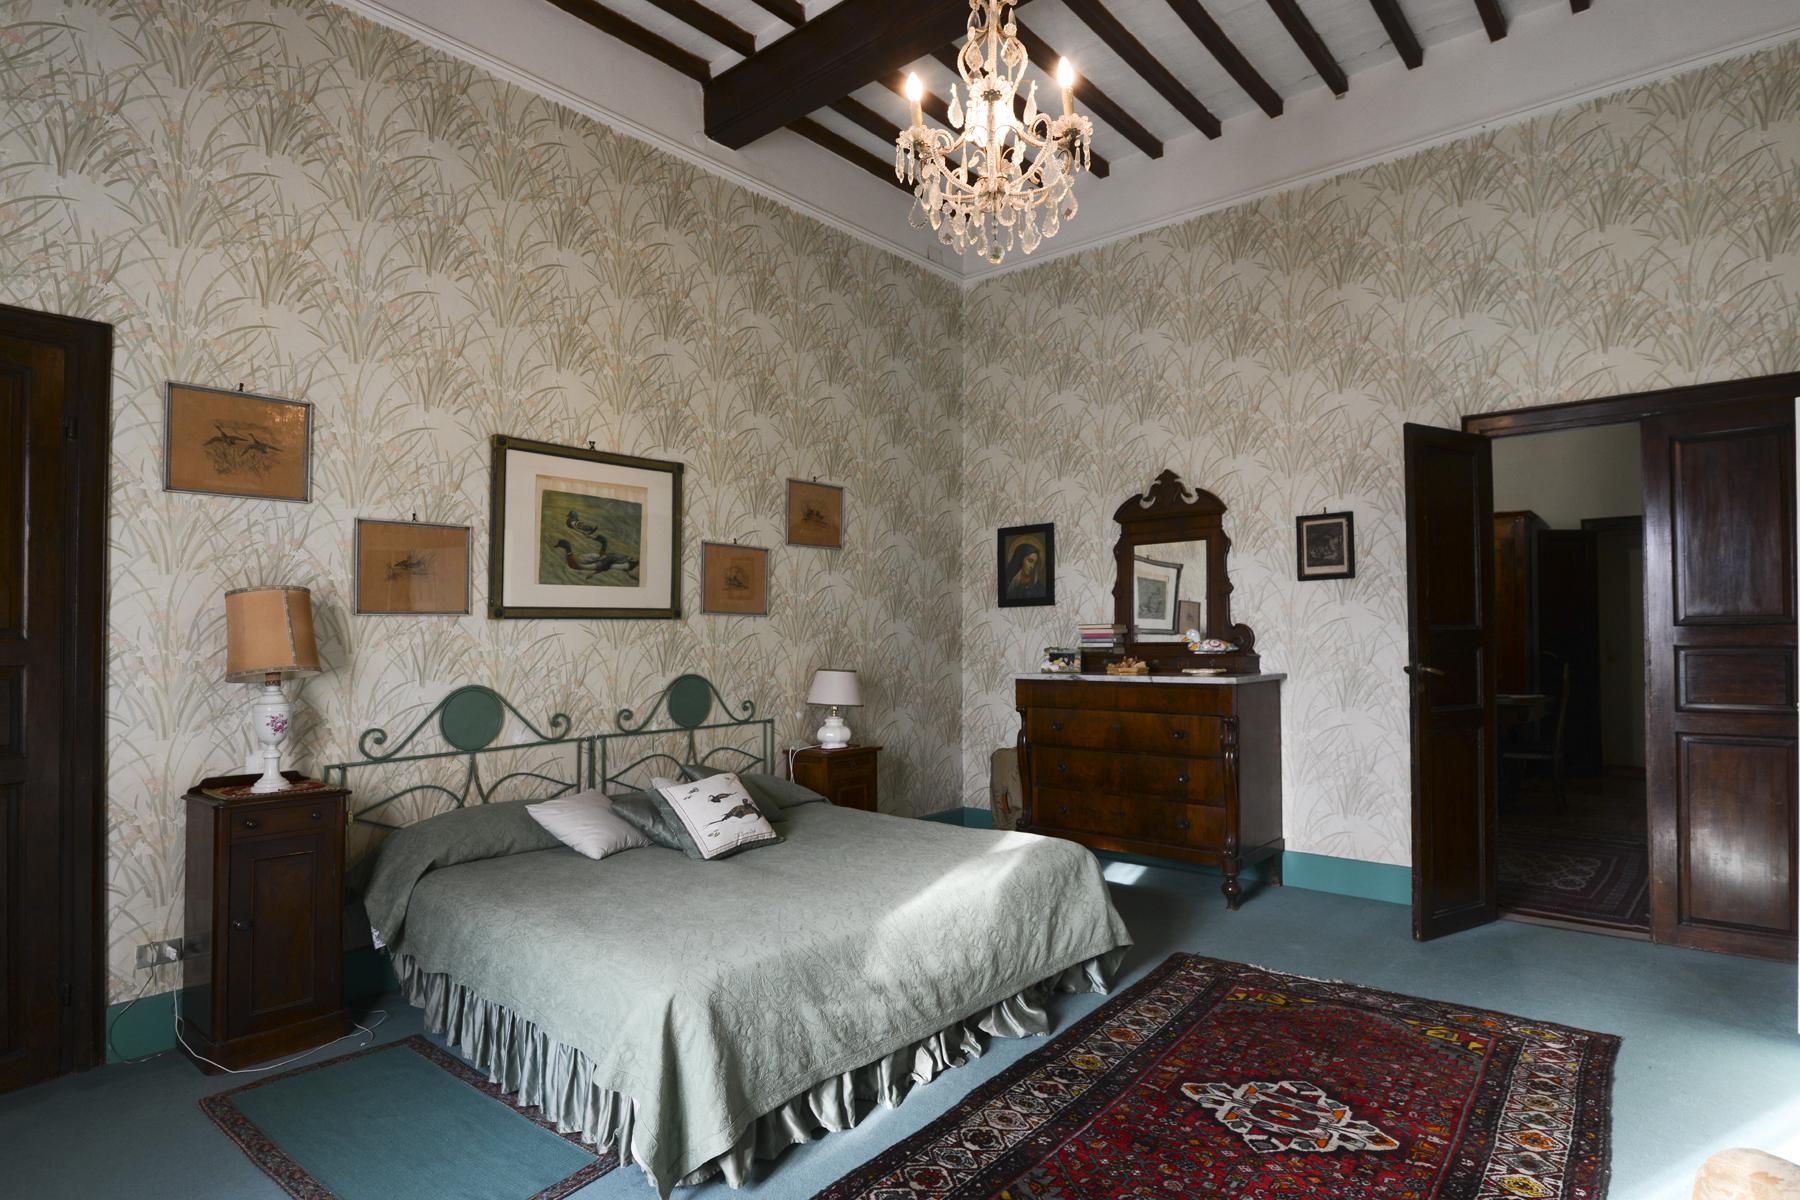 Villa in Vendita a Casciana Terme Lari: 5 locali, 1800 mq - Foto 11